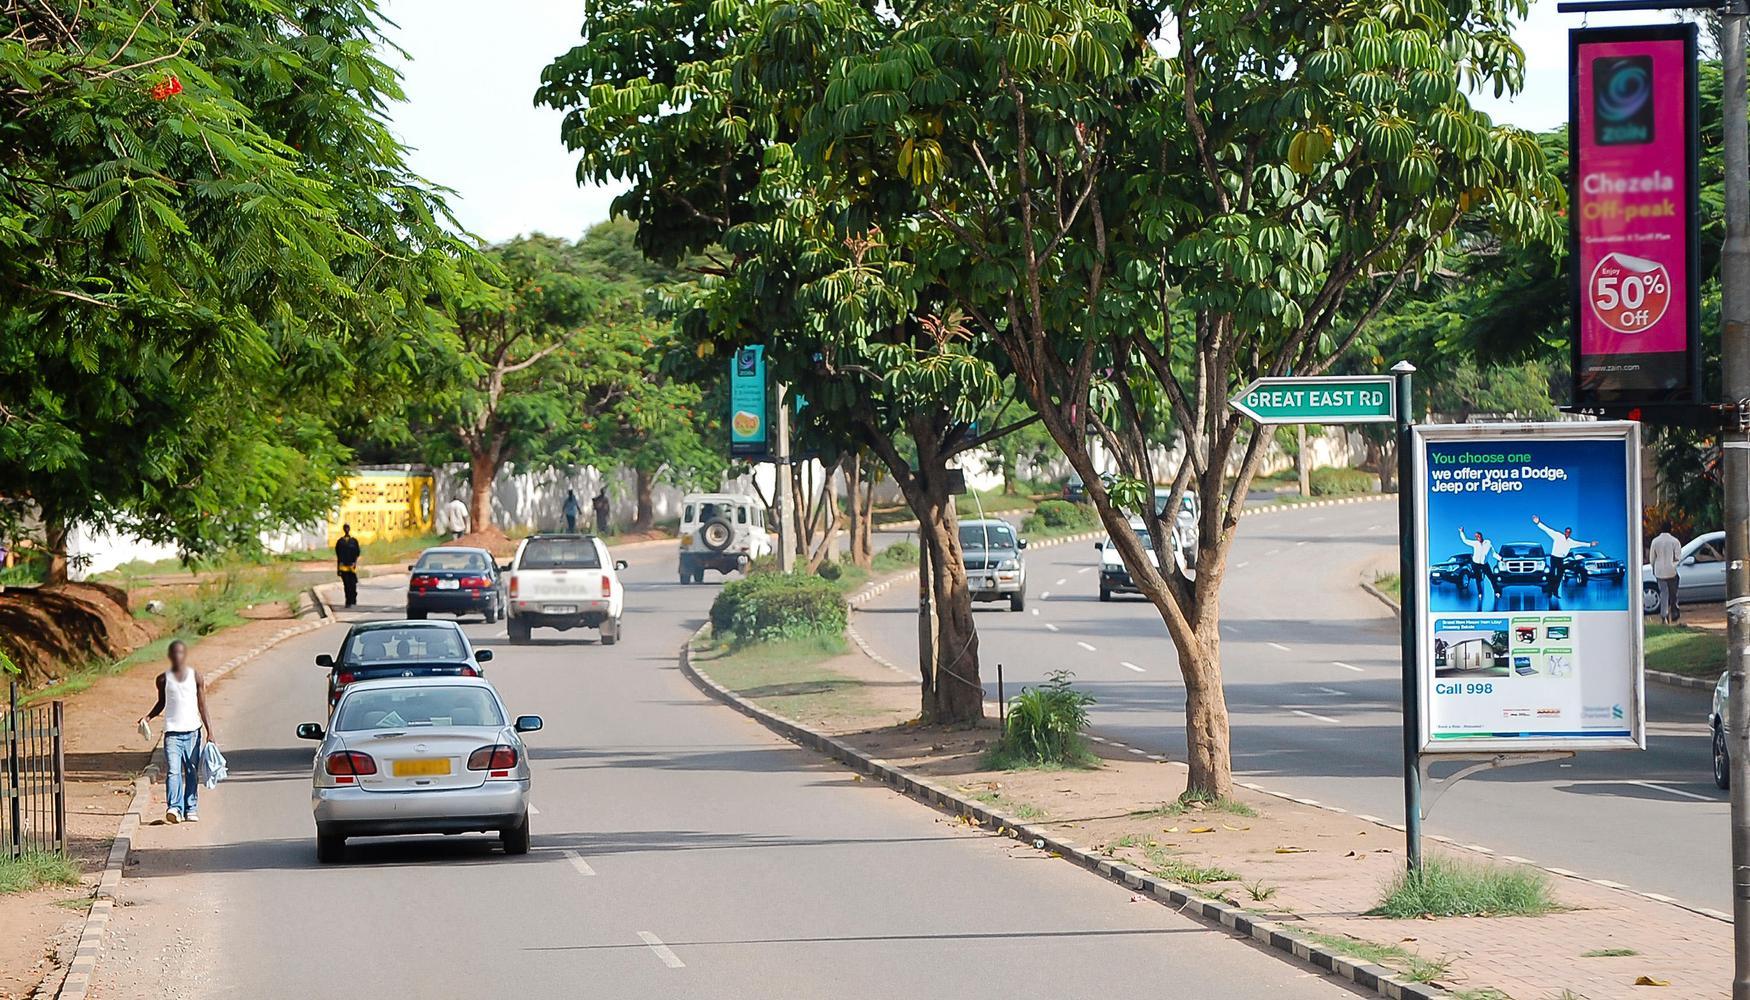 Car hire at Lusaka Airport